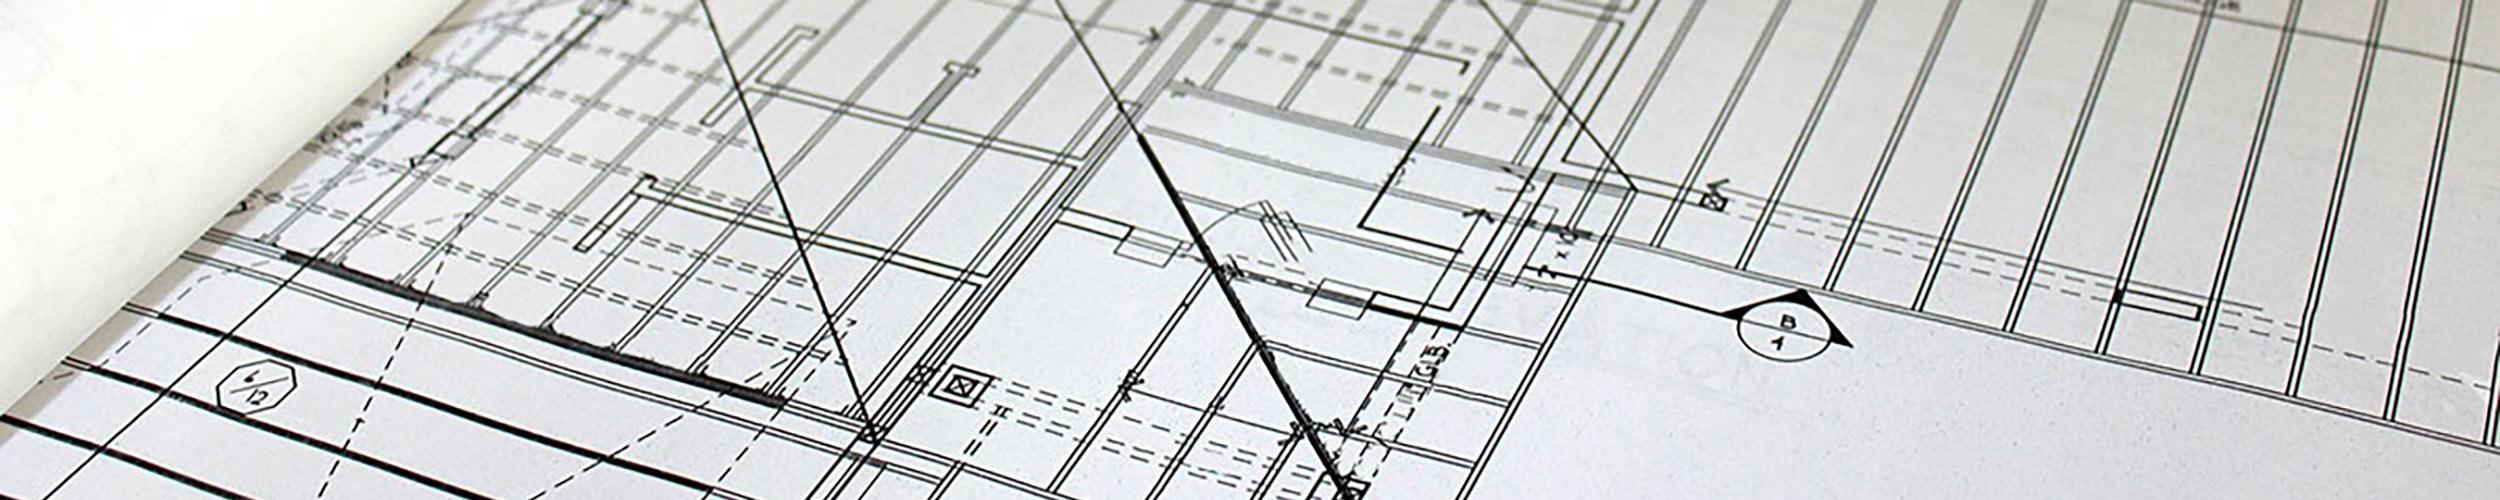 Price list | DJS Architecture